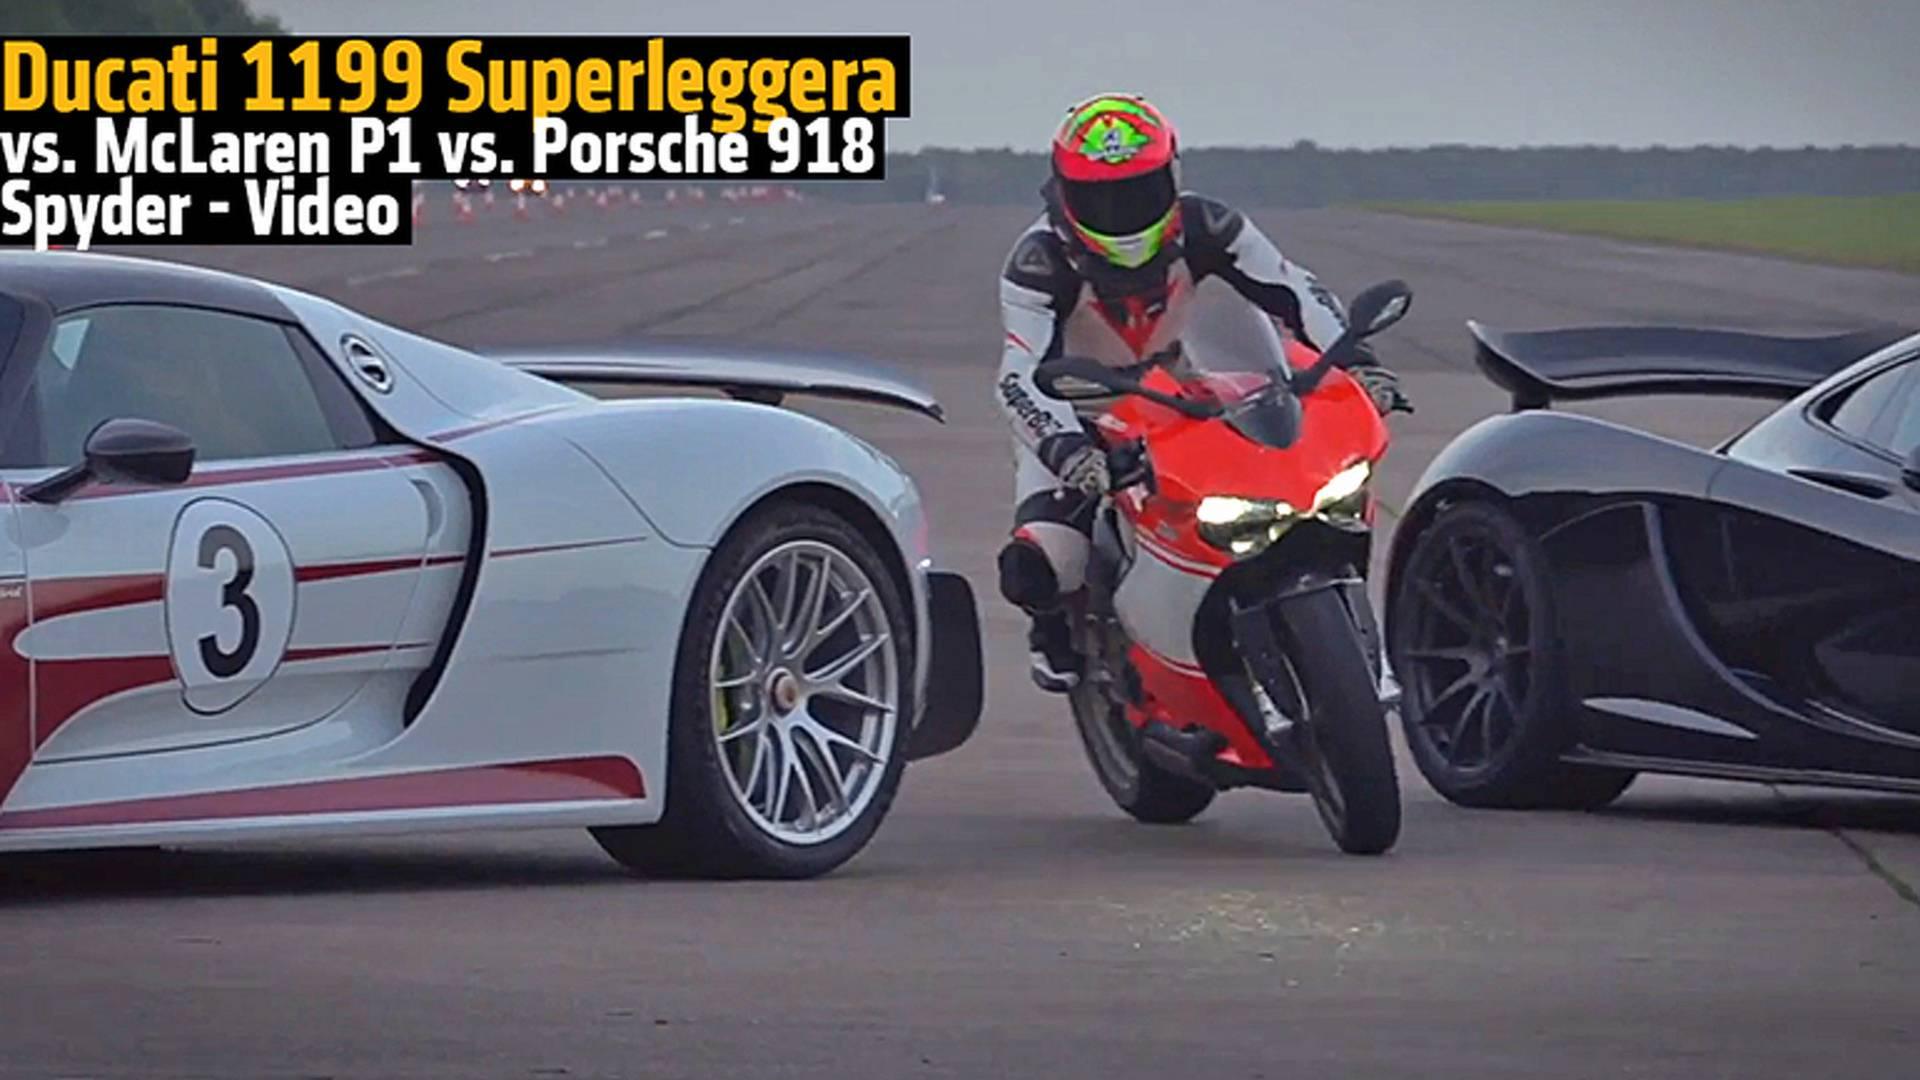 Ducati 1199 Superleggera Vs Mclaren P1 Vs Porsche 918 Spyder Video